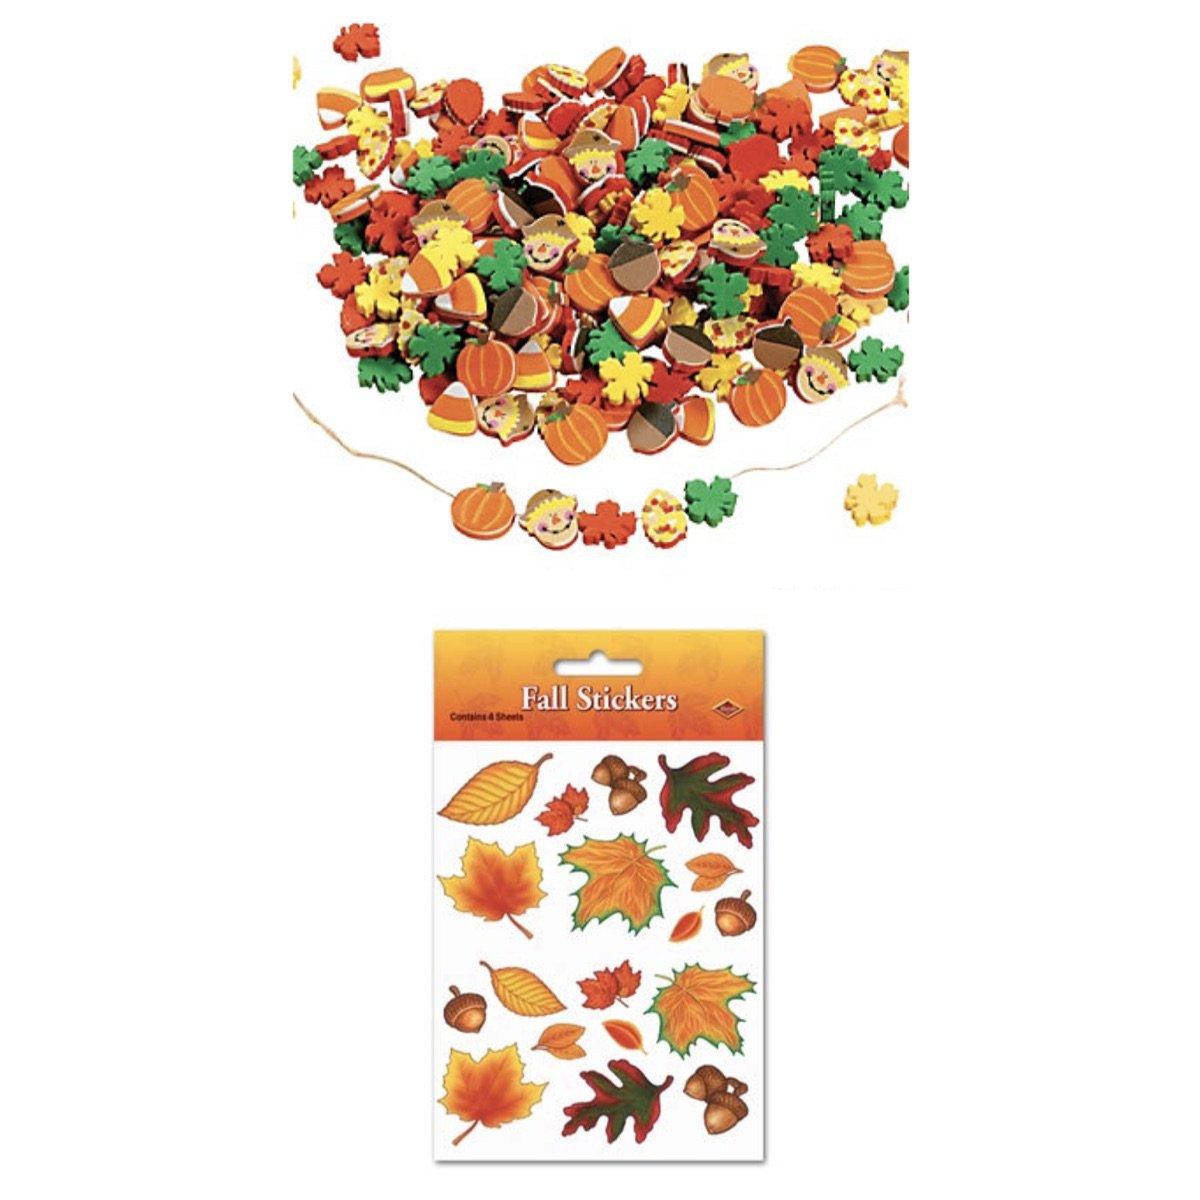 Autumn HARVEST Craft & Sticker Set - 500 FOAM Fall BEADS & 72 Stickers LEAVES Foliage - Leaf KID'S Activity TEACHER Scouts